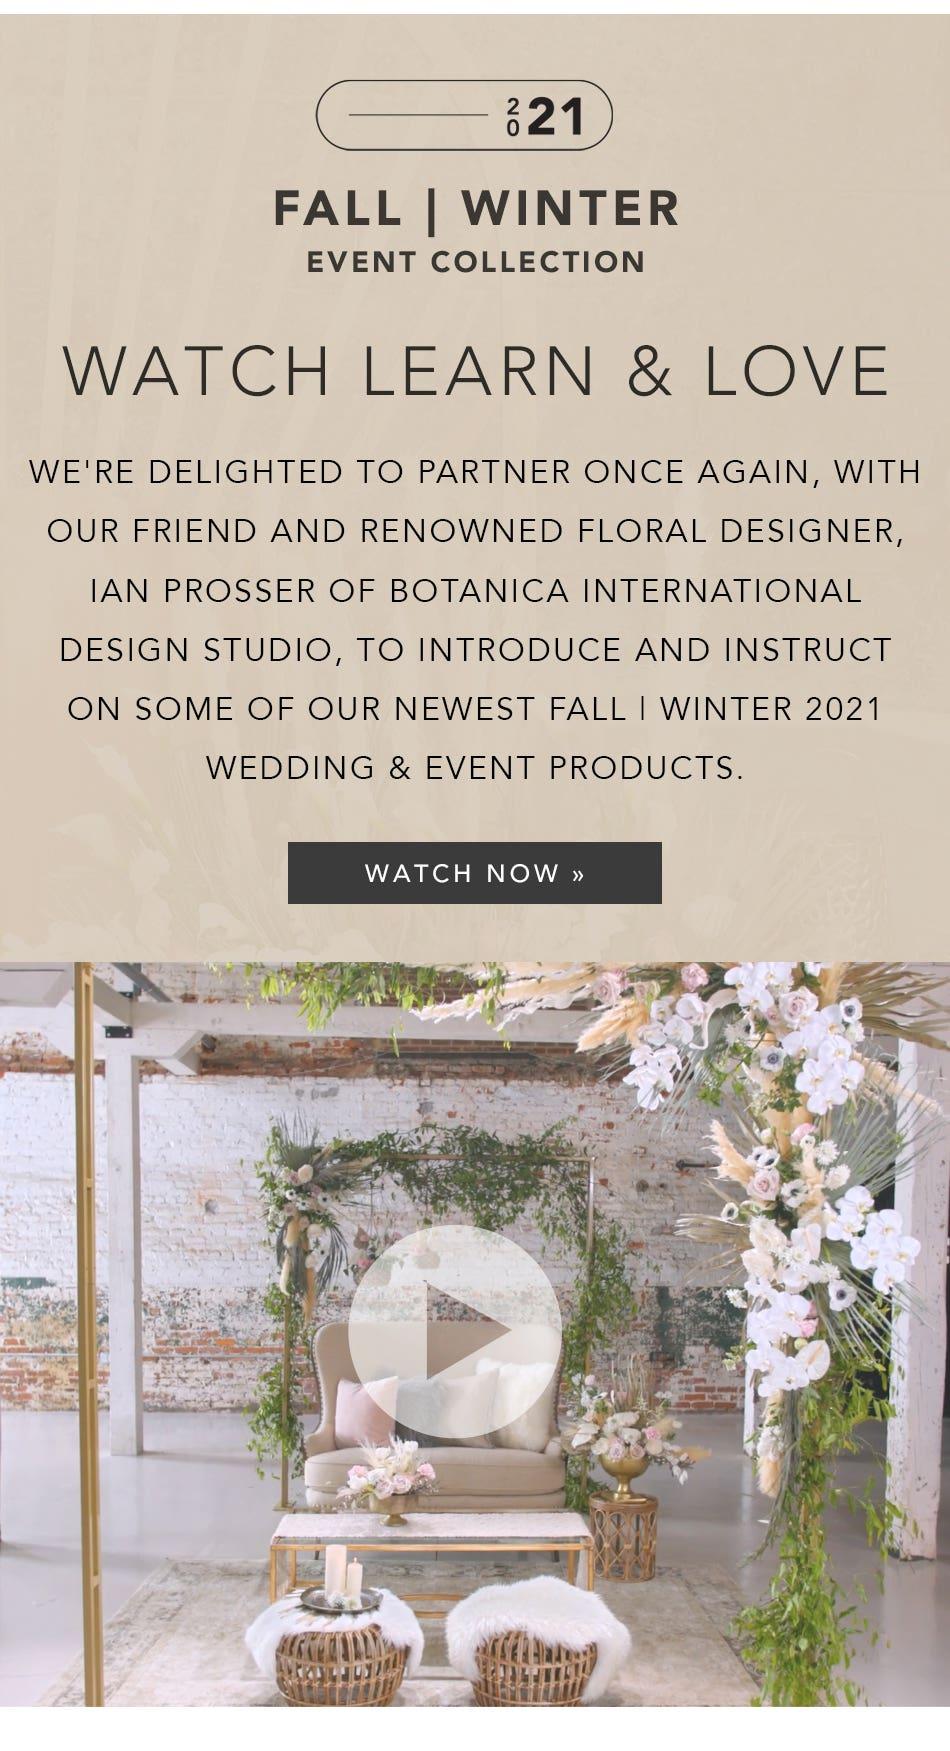 Fall/Winter Event Collection, Watch Ian Prosser of Botanica International Design Studio